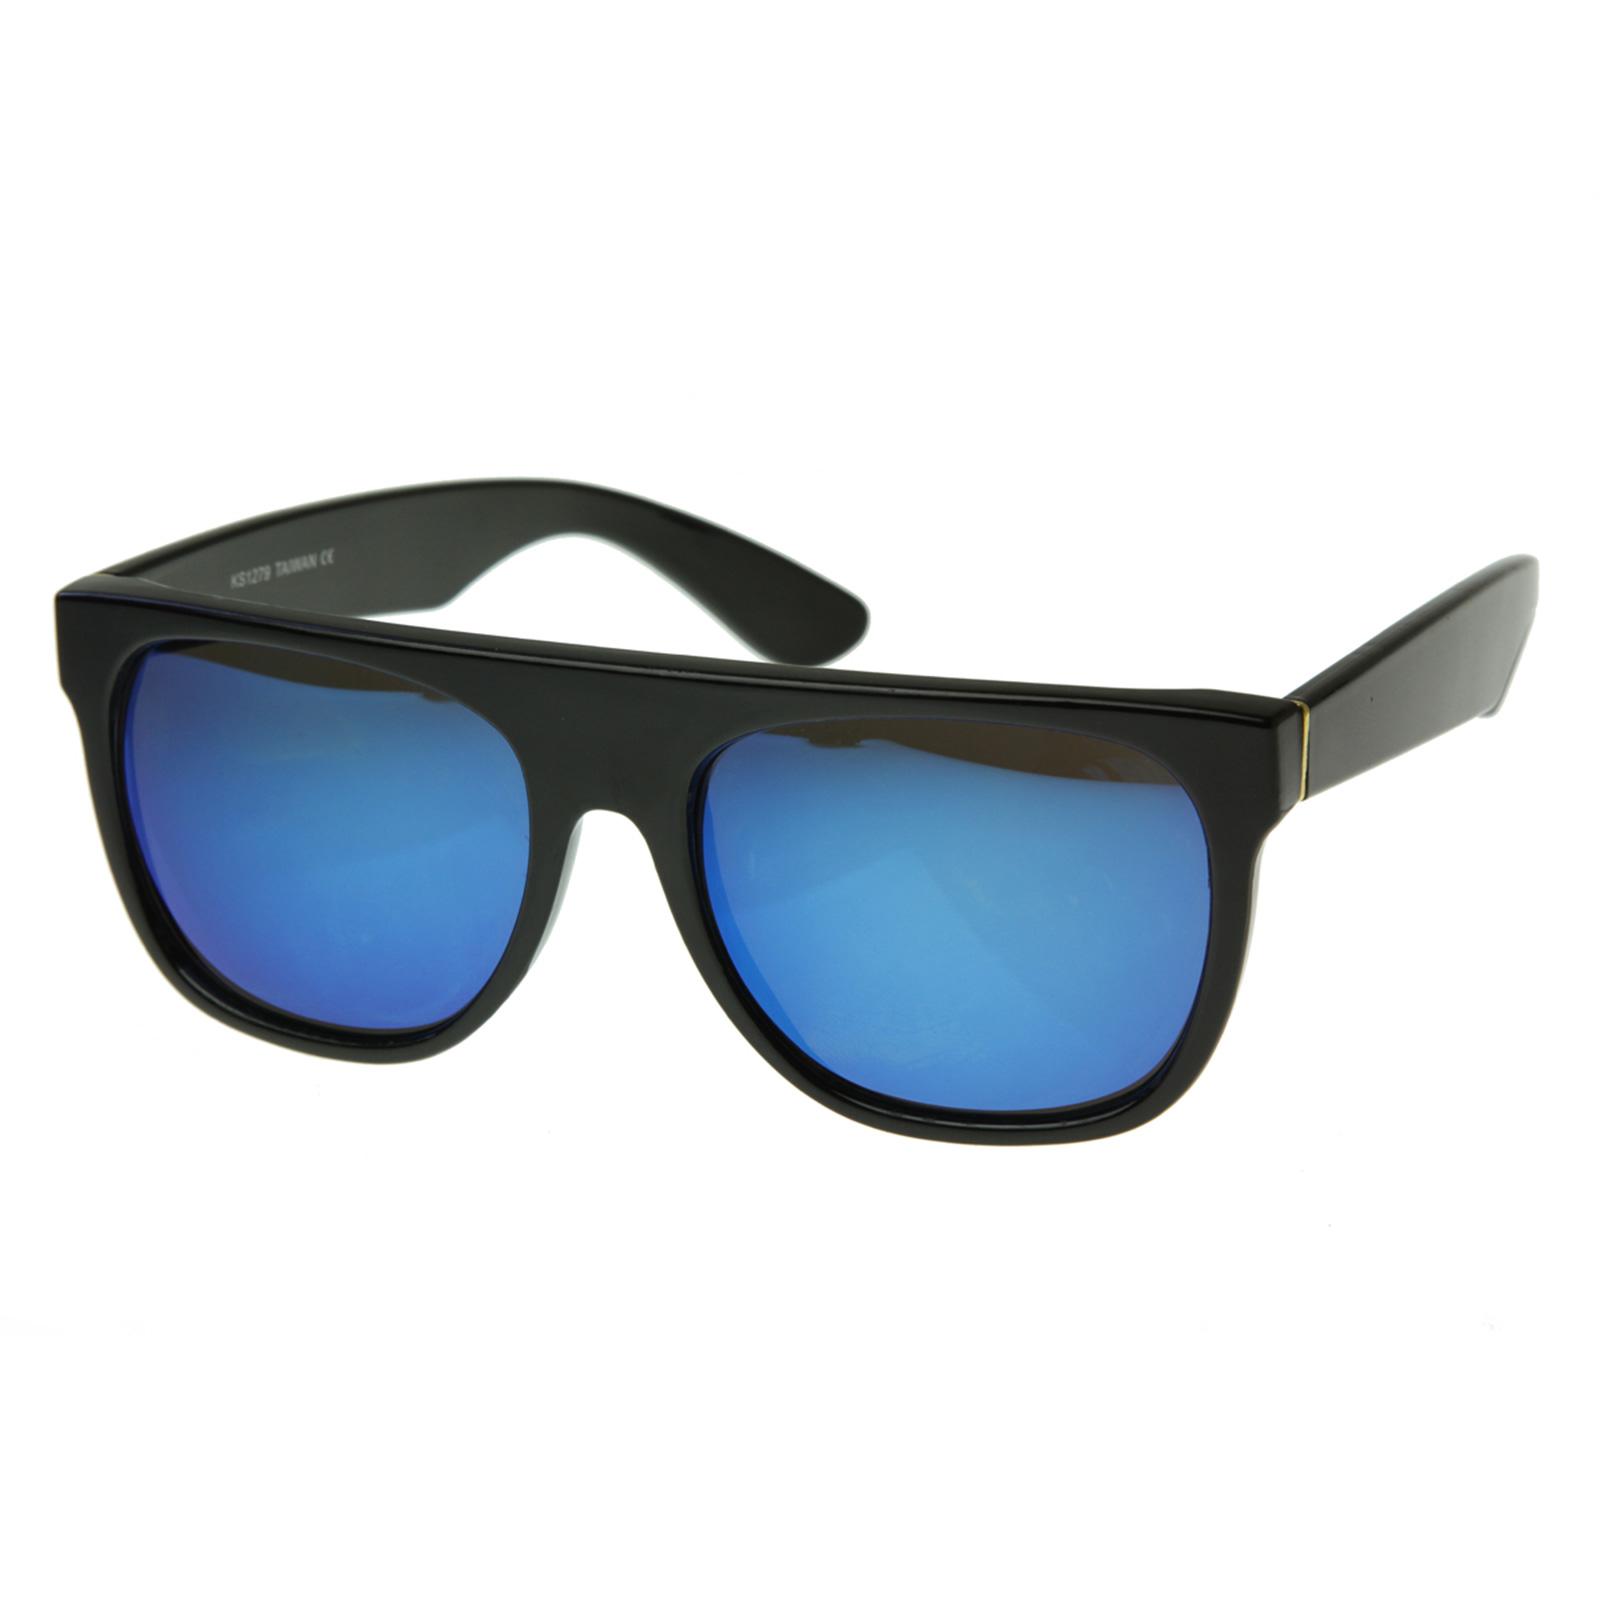 bright revo mirror lens super flat top wayfarer sunglasses 8